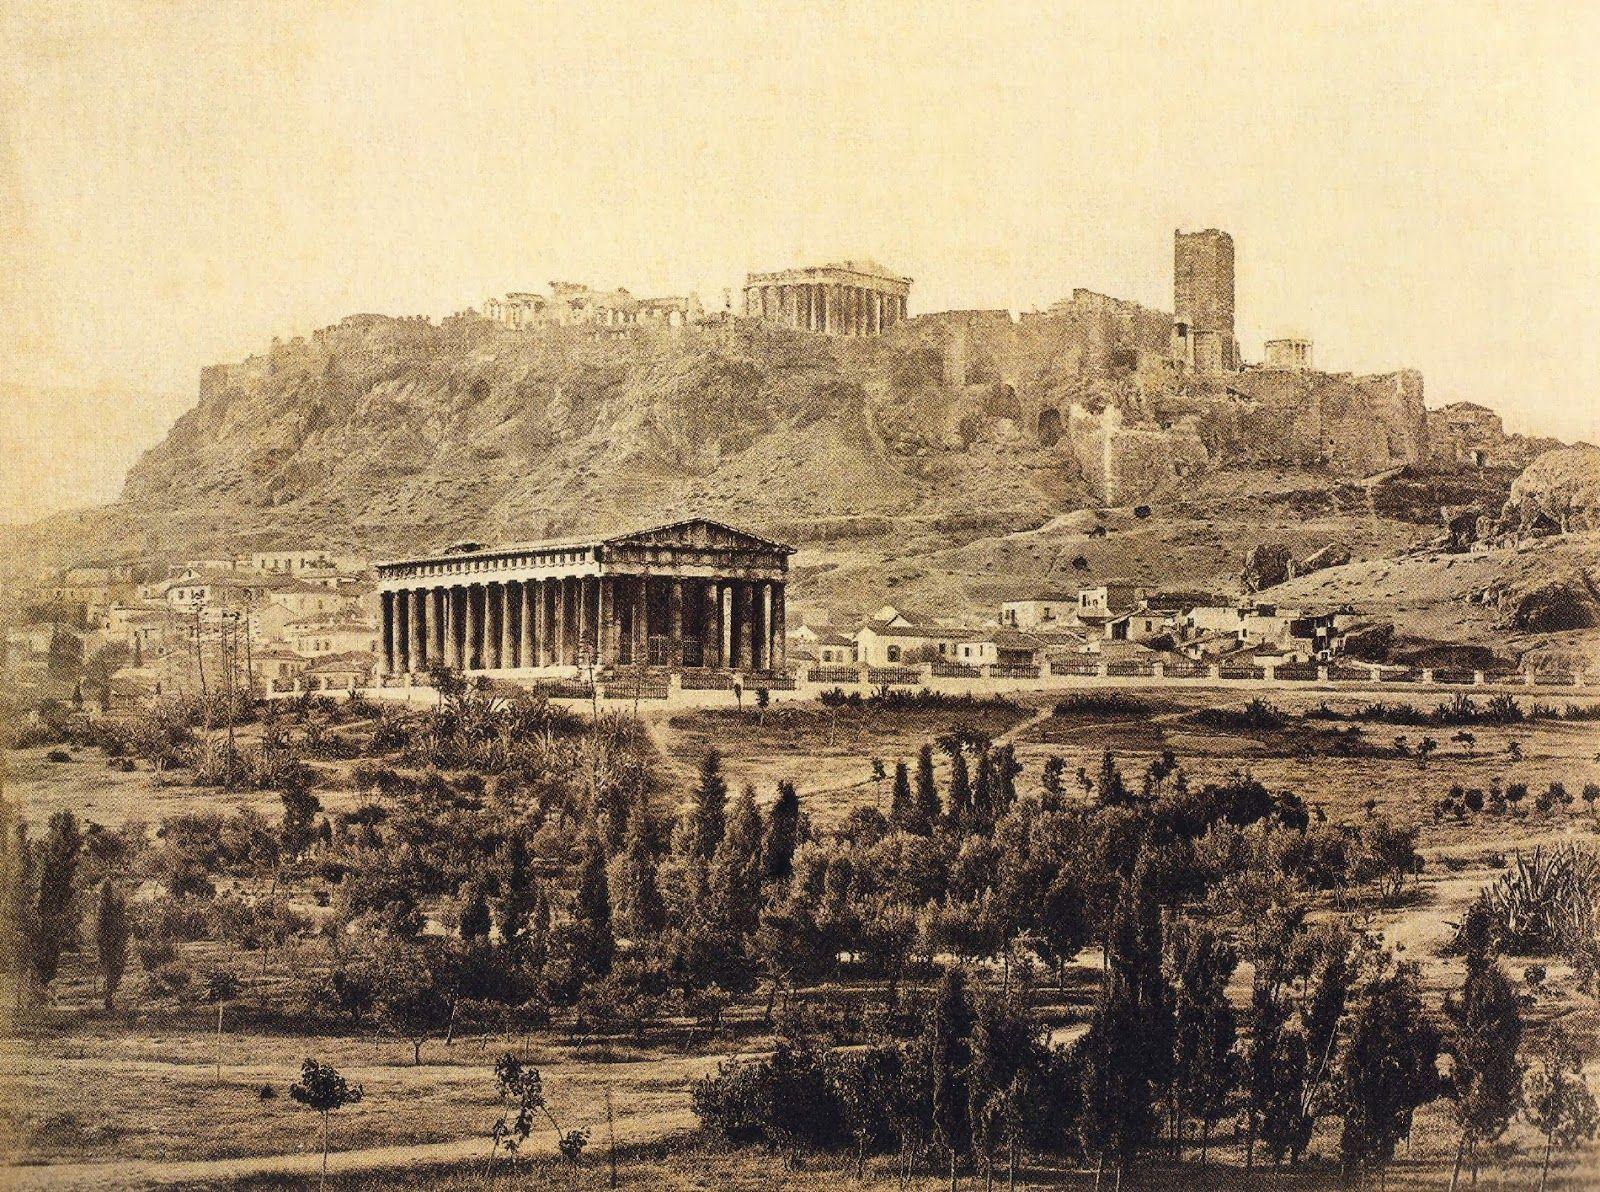 A8hna Toy 1839 1900 Visiting Greece Athens Athens Greece